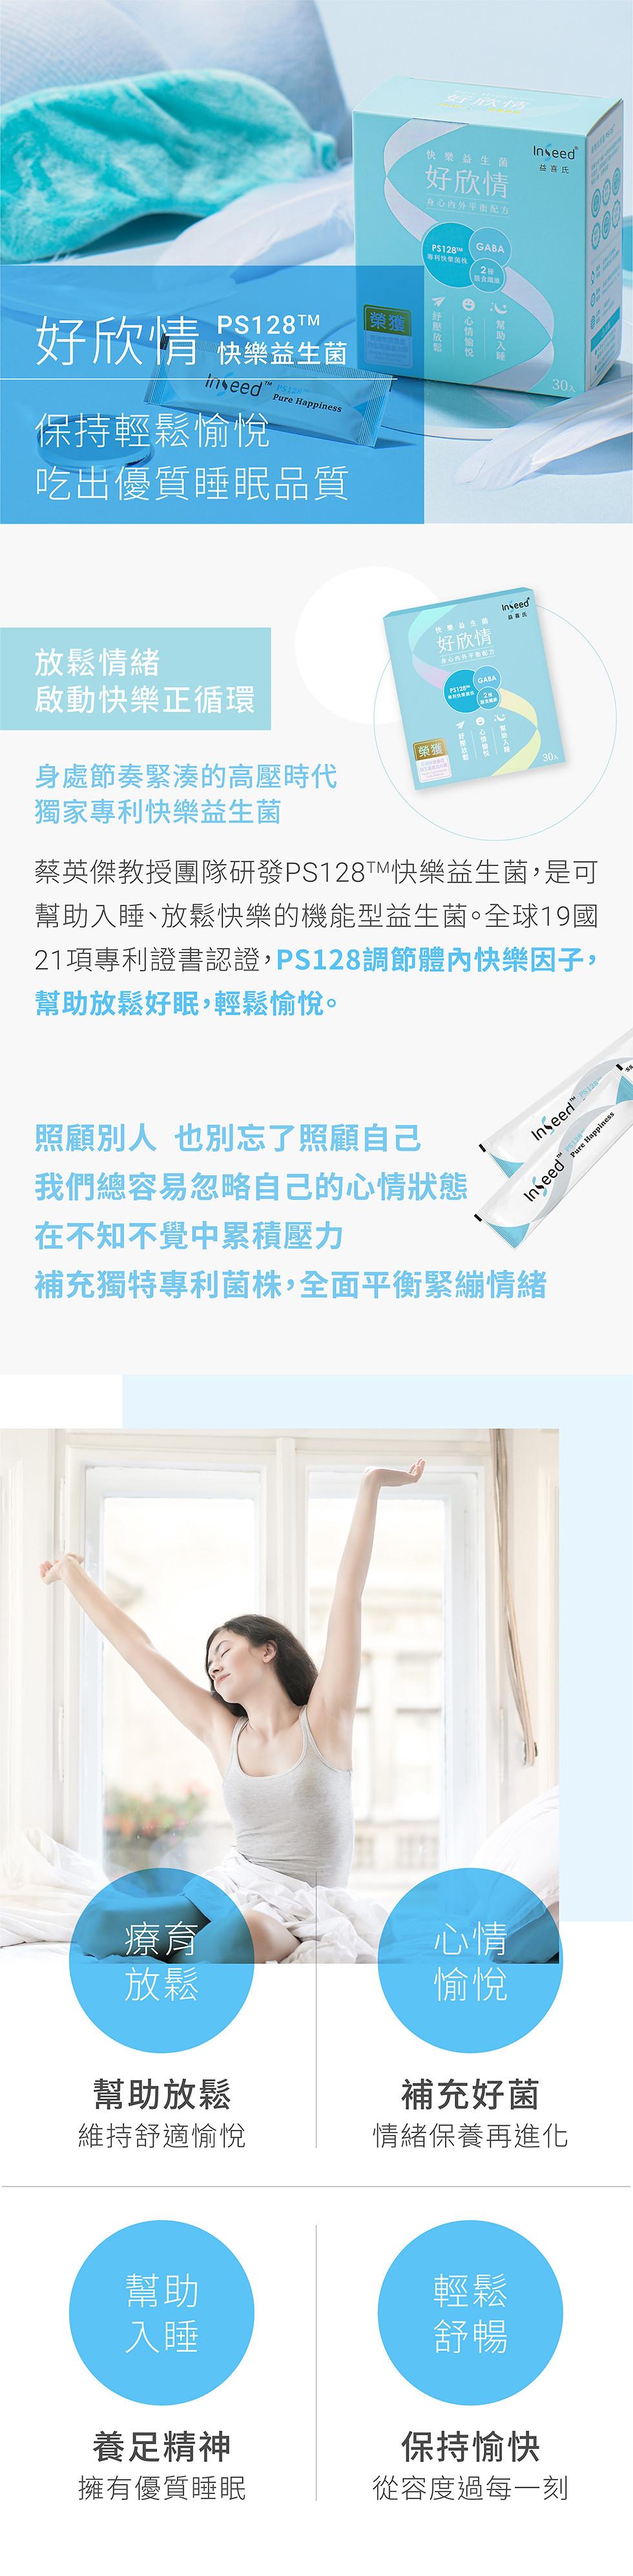 Productpage臨時版_好欣情_01.jpg